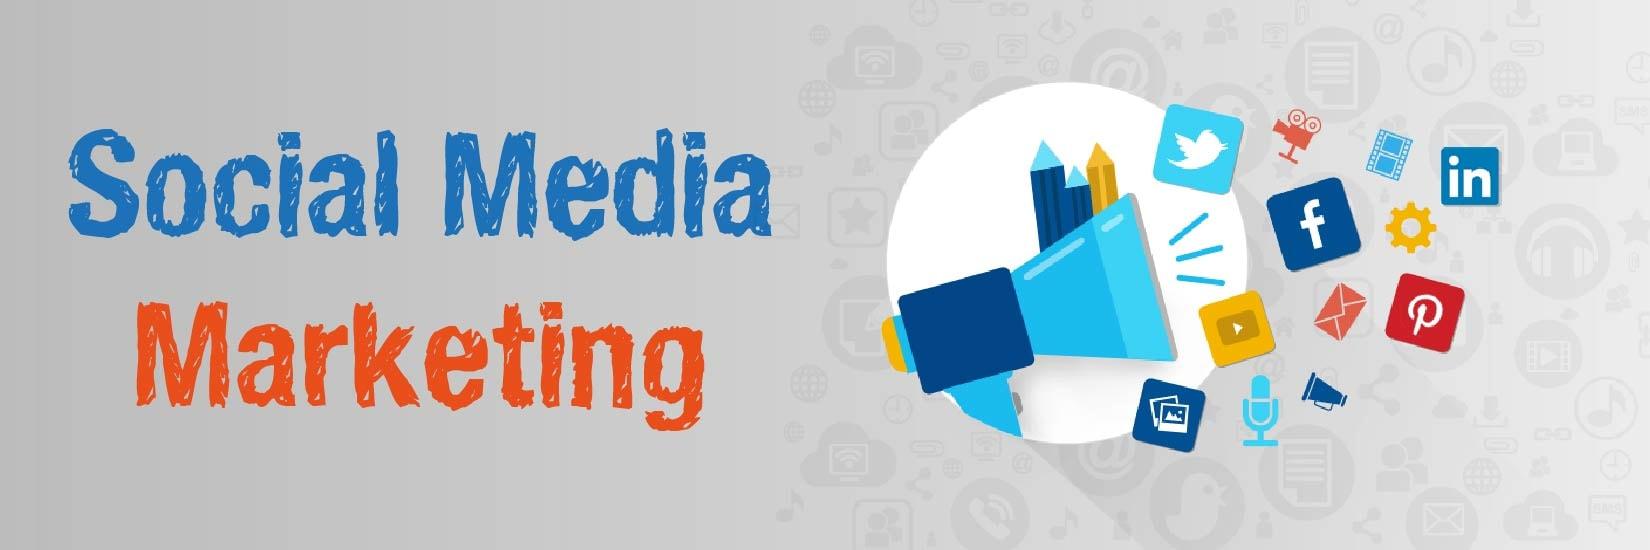 ADVERTISING / SEO / INTERNET MARKETING COMPANY MERCHANT SERVICES